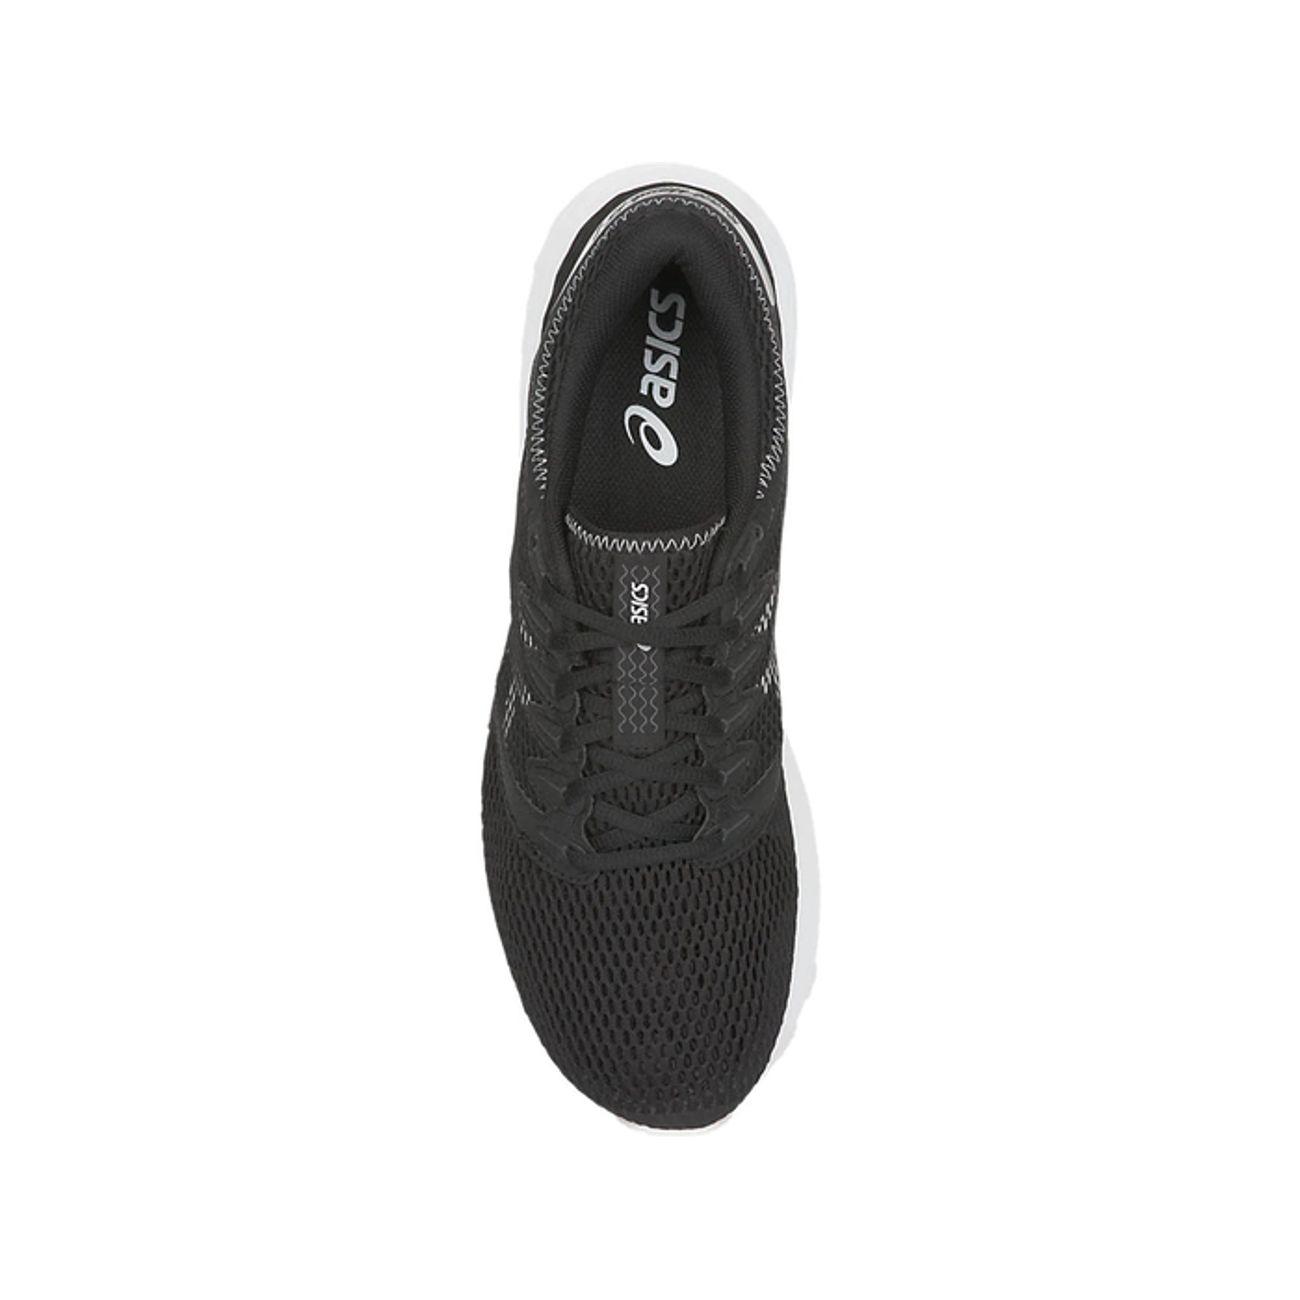 Running Roadhawk Chaussures Basses Homme Ff 2 Asics kwTlPuXZiO